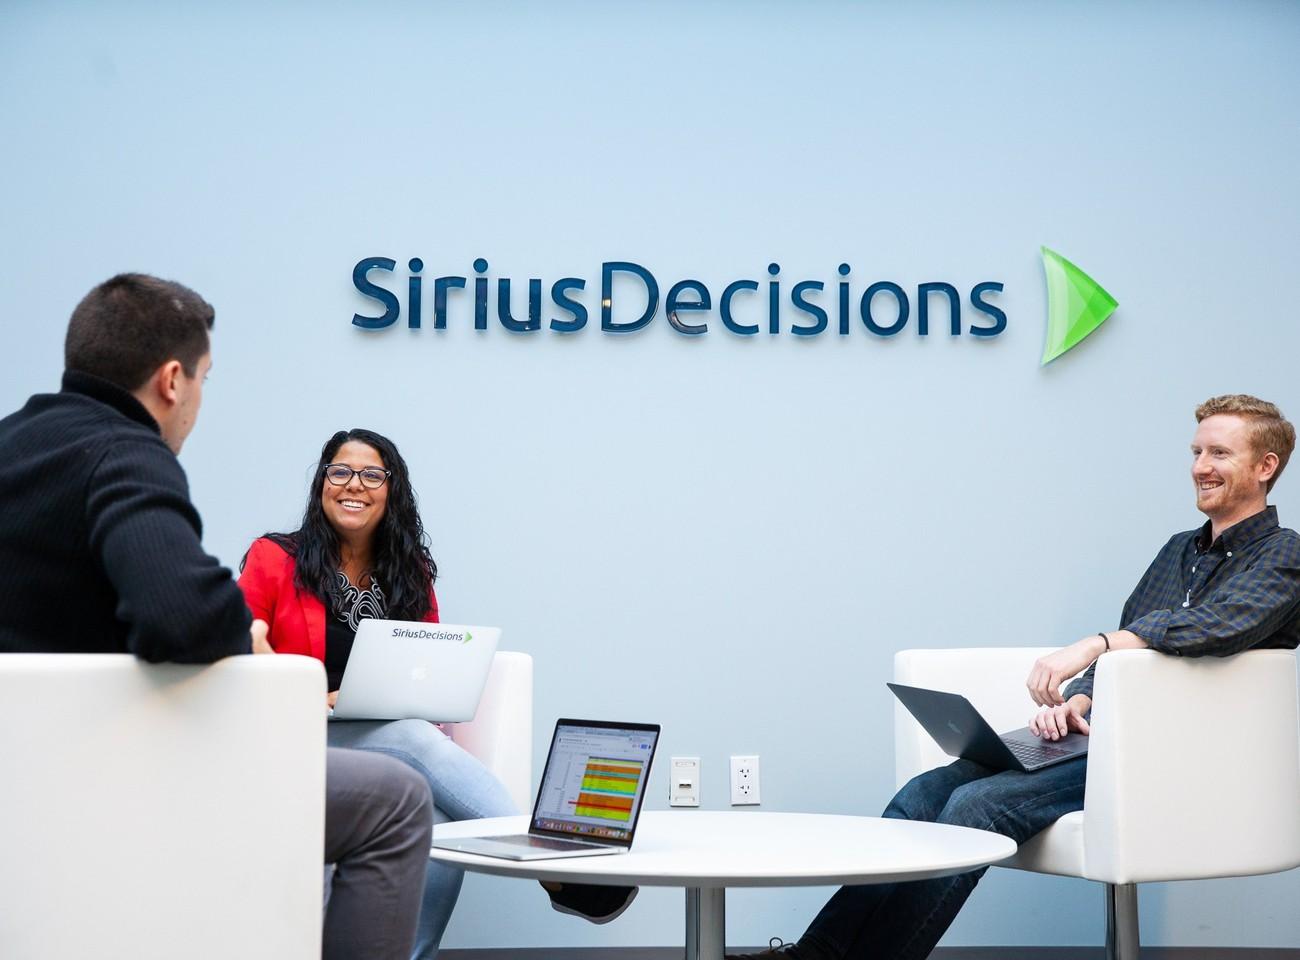 SiriusDecisions Careers